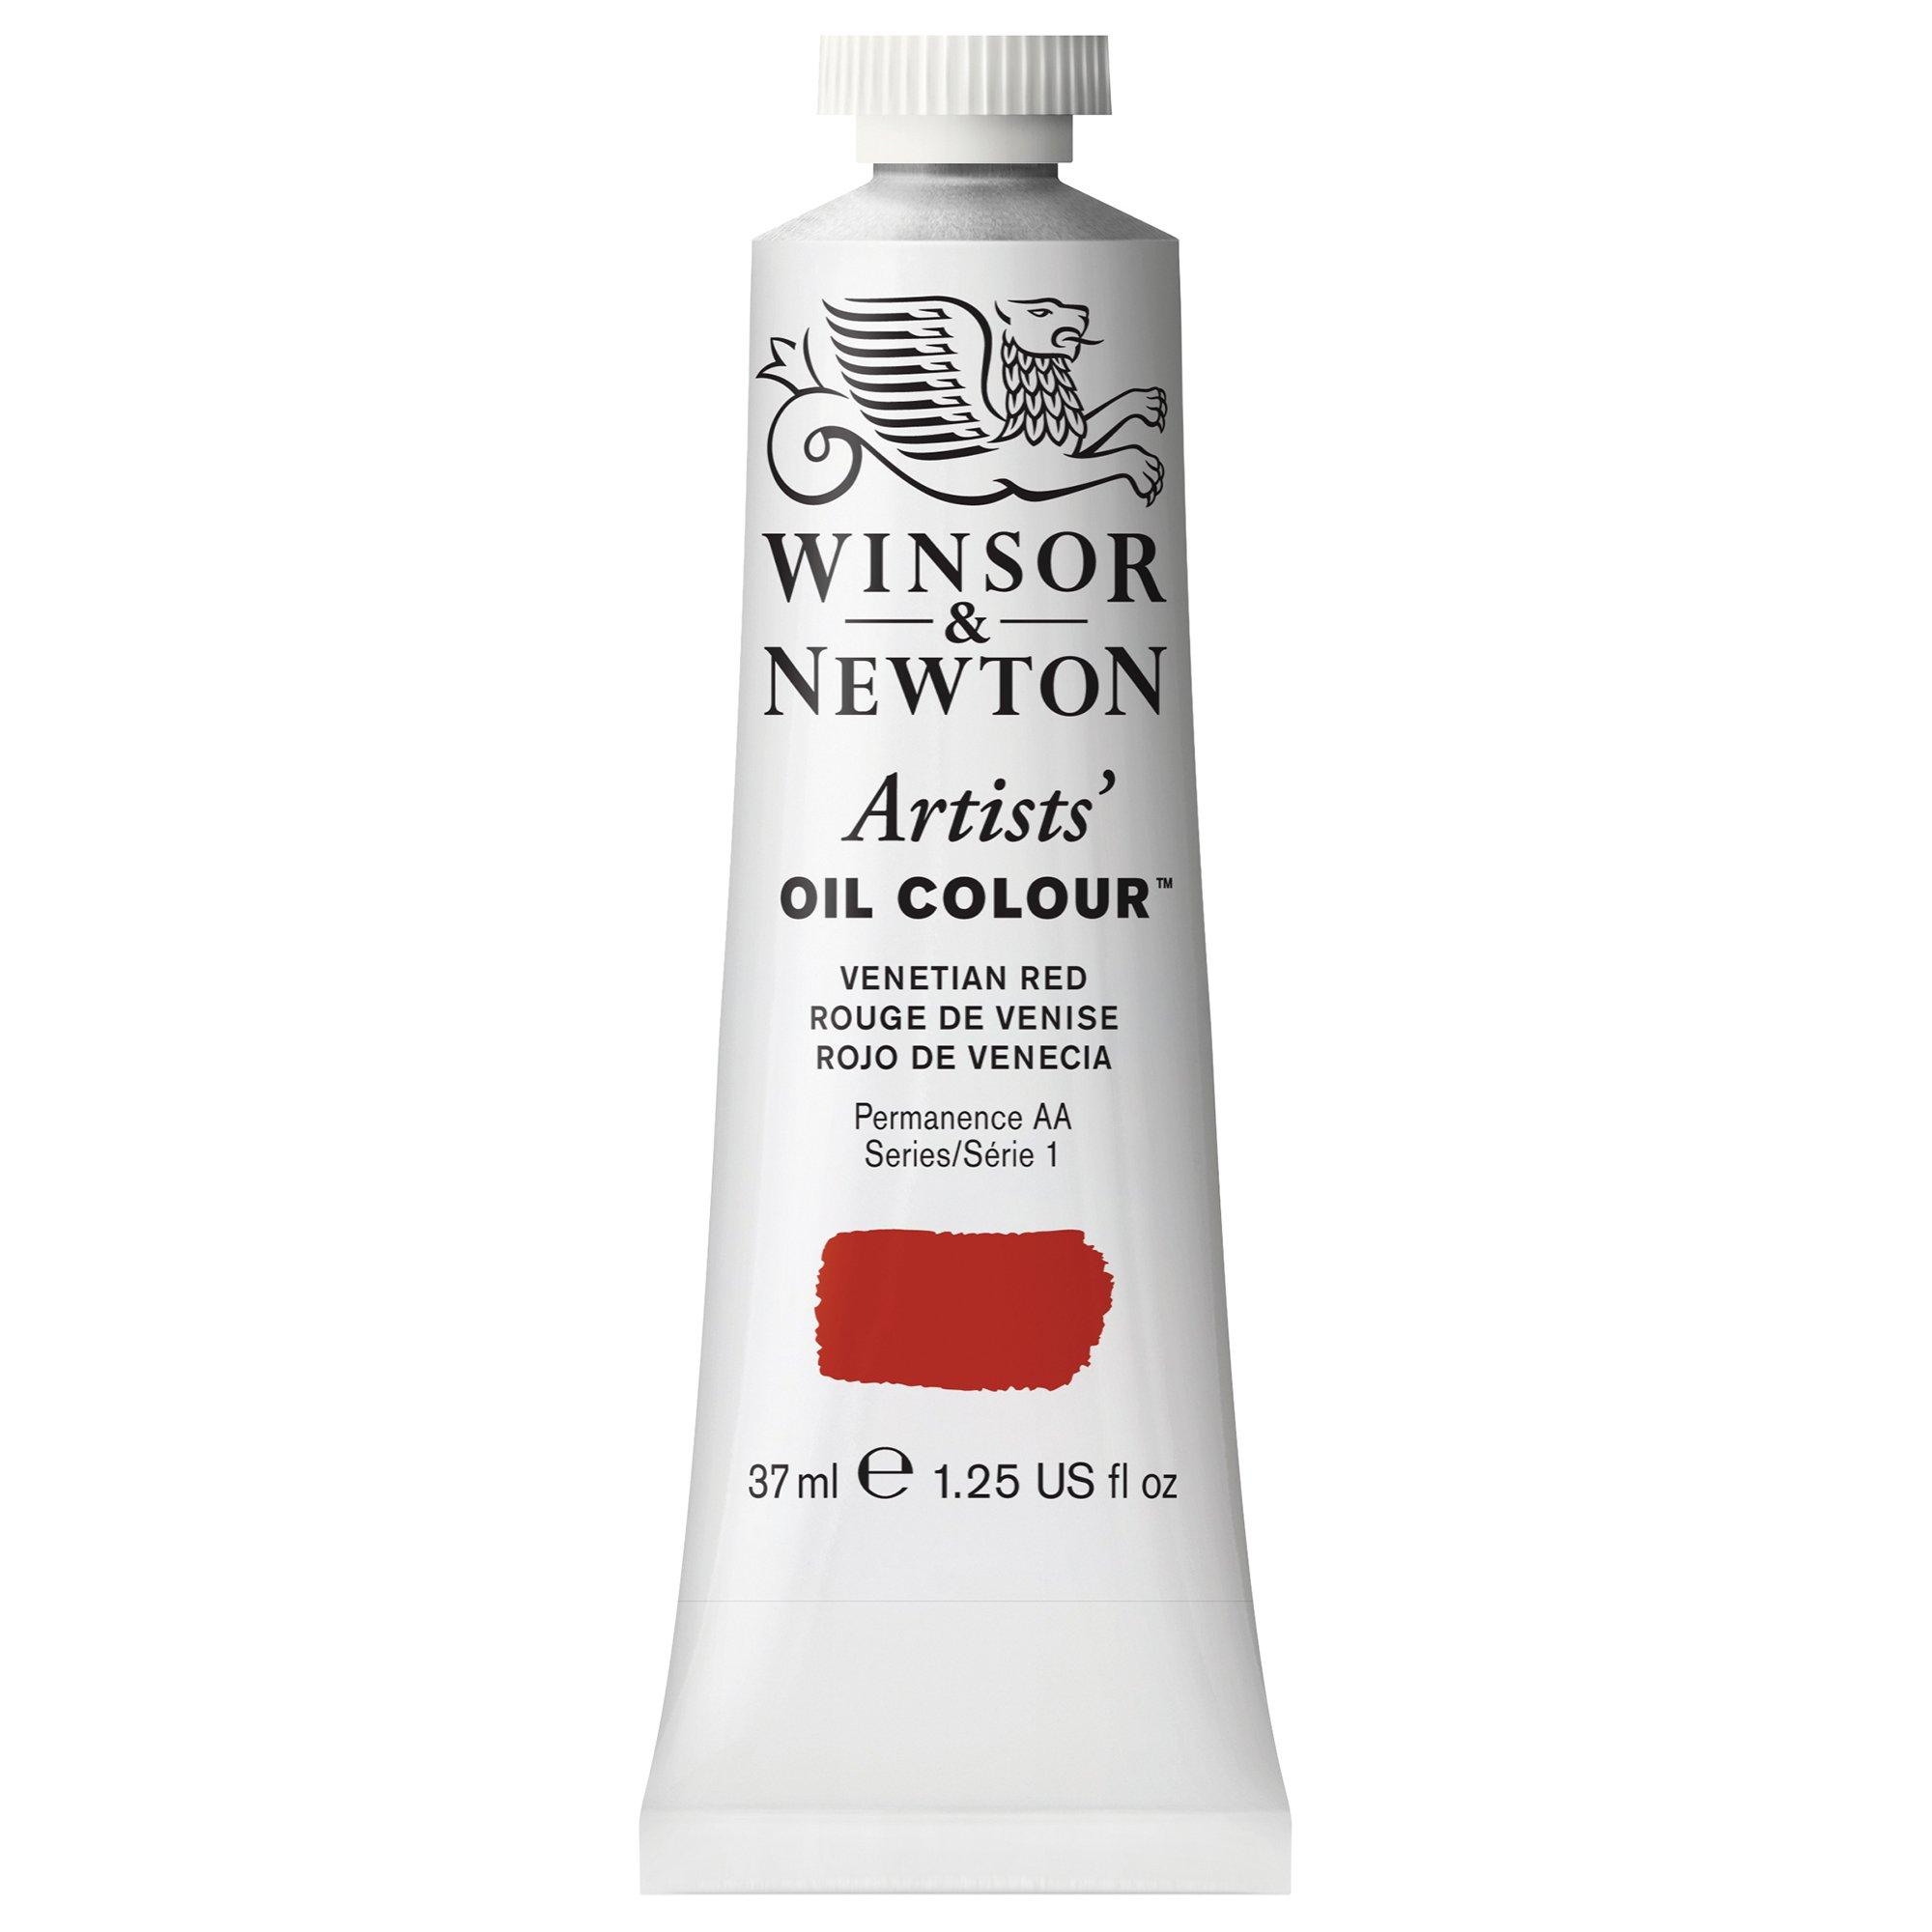 Winsor & Newton Artists' Oil Colour Paint, 37ml Tube, Venetian Red